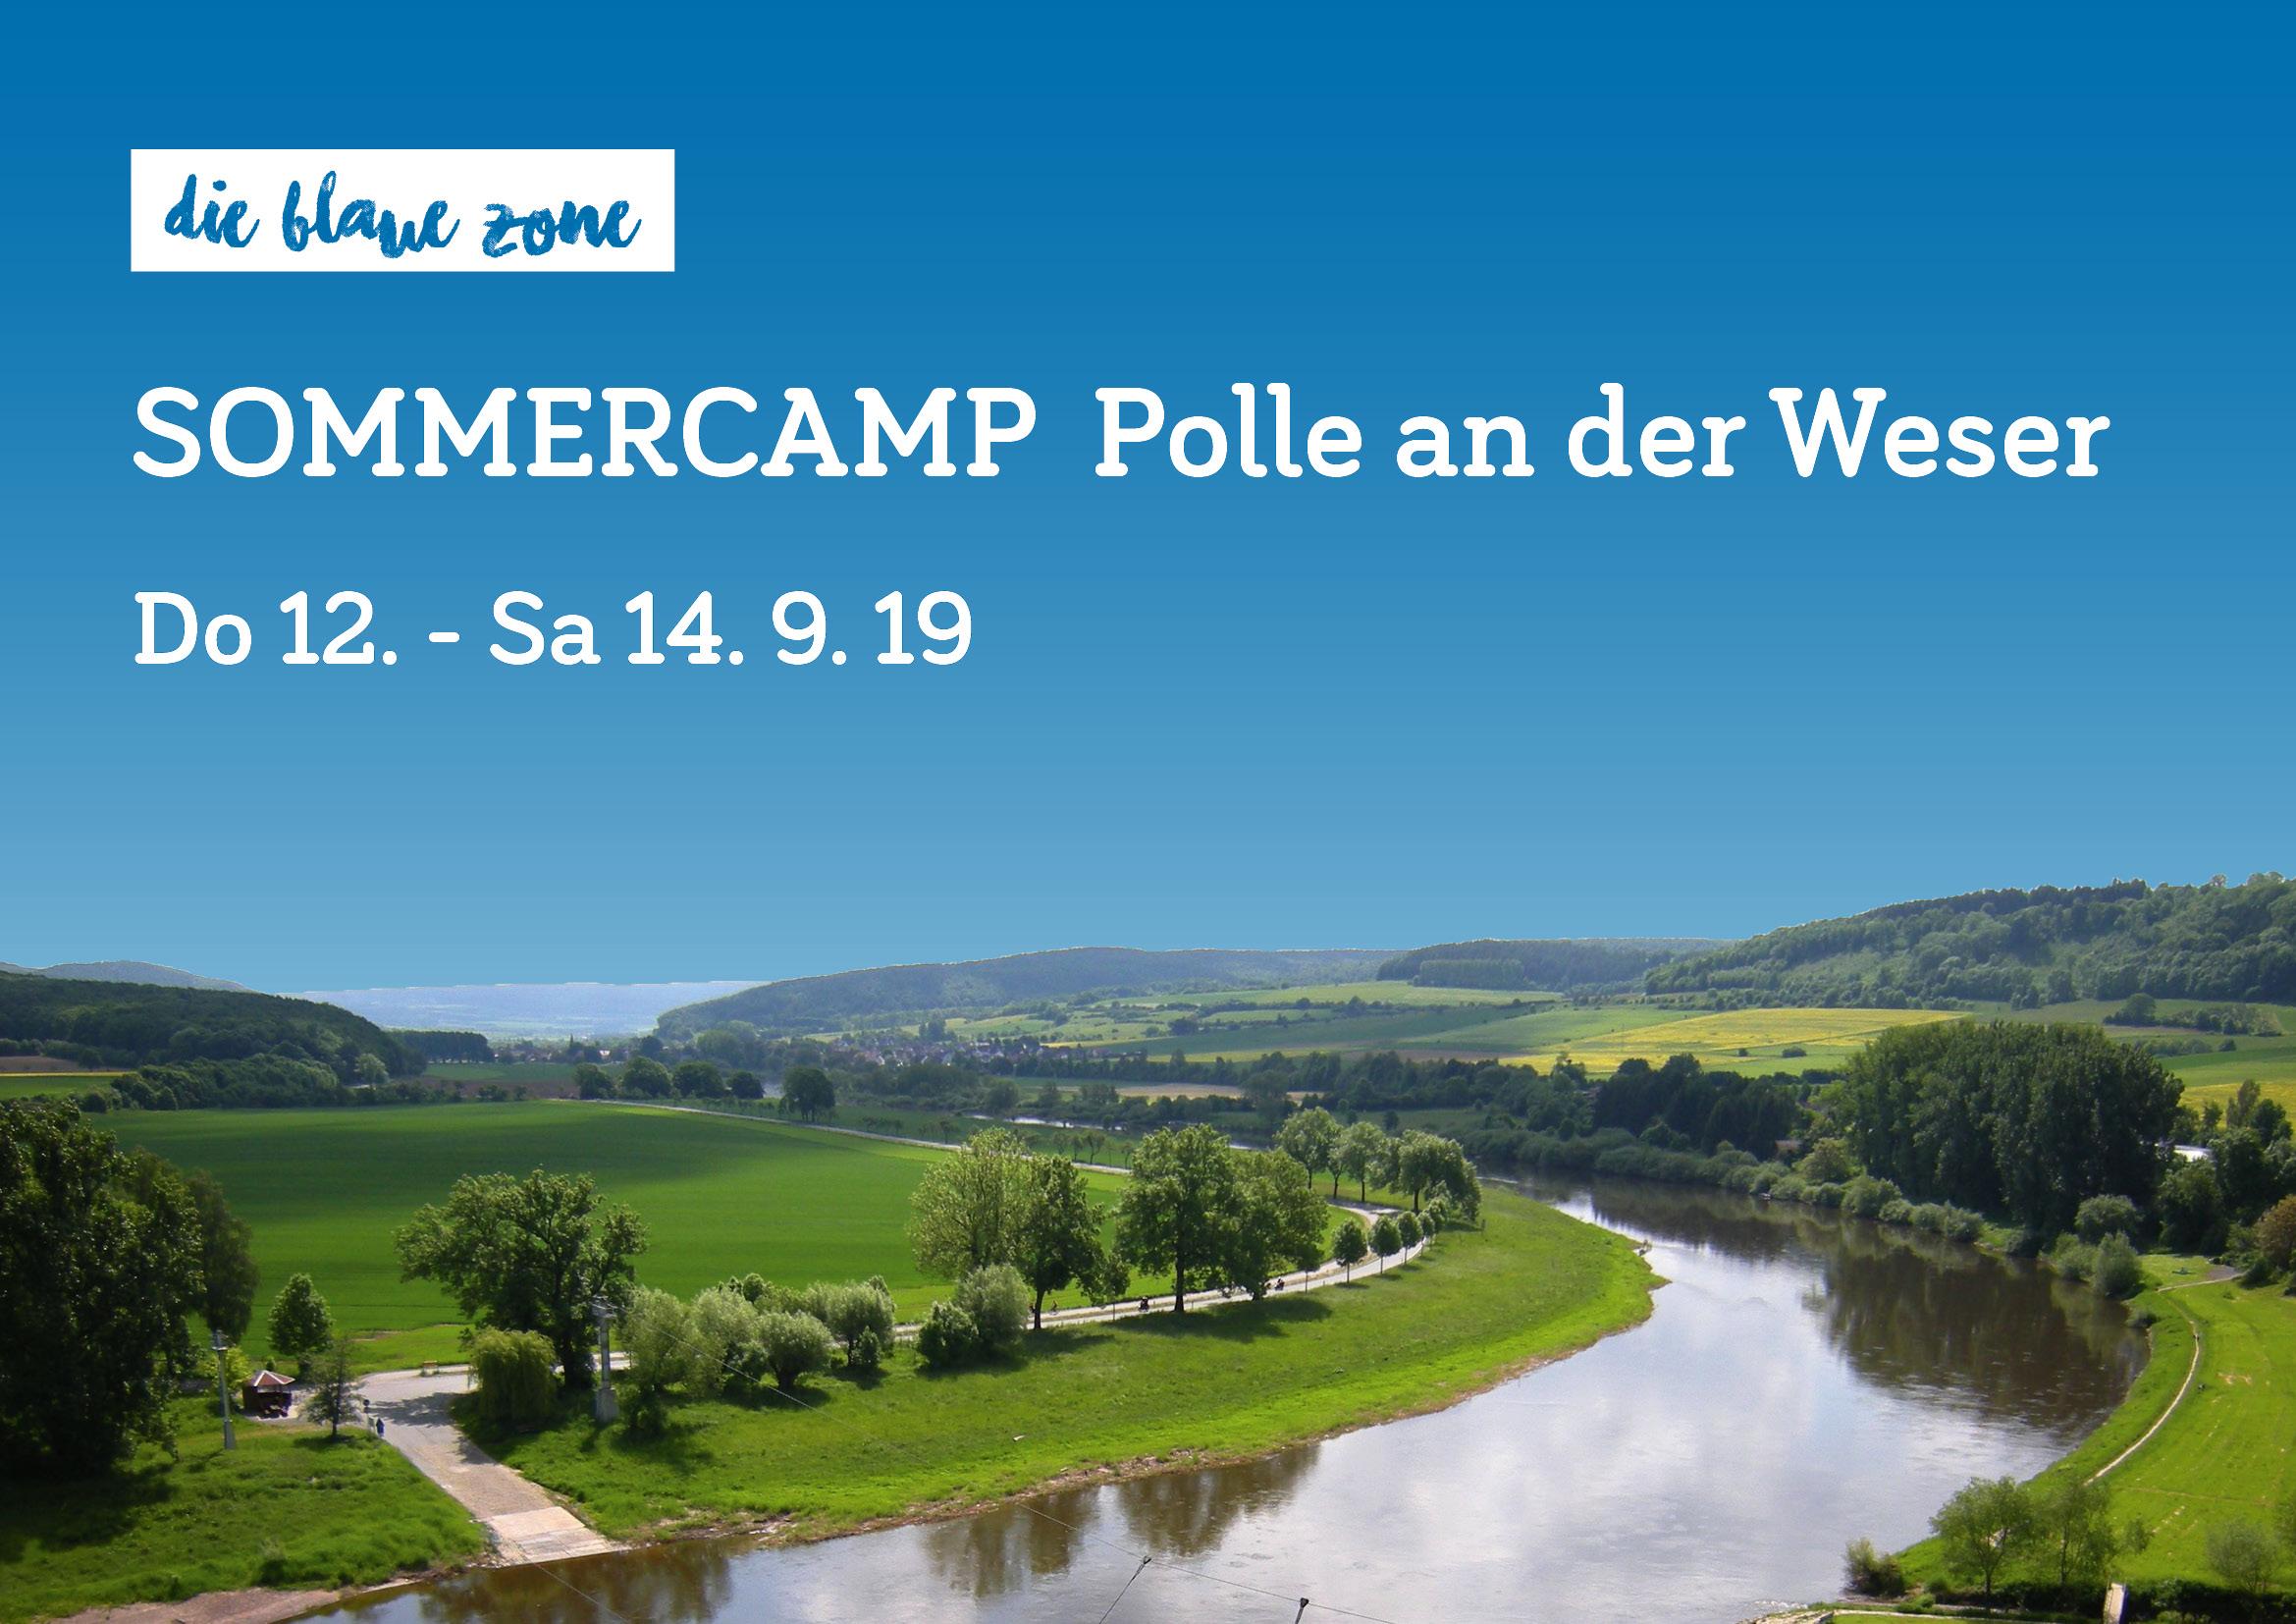 Blaue Zone Sommercamp Polle Bild_Franzfoto_Wikimedia